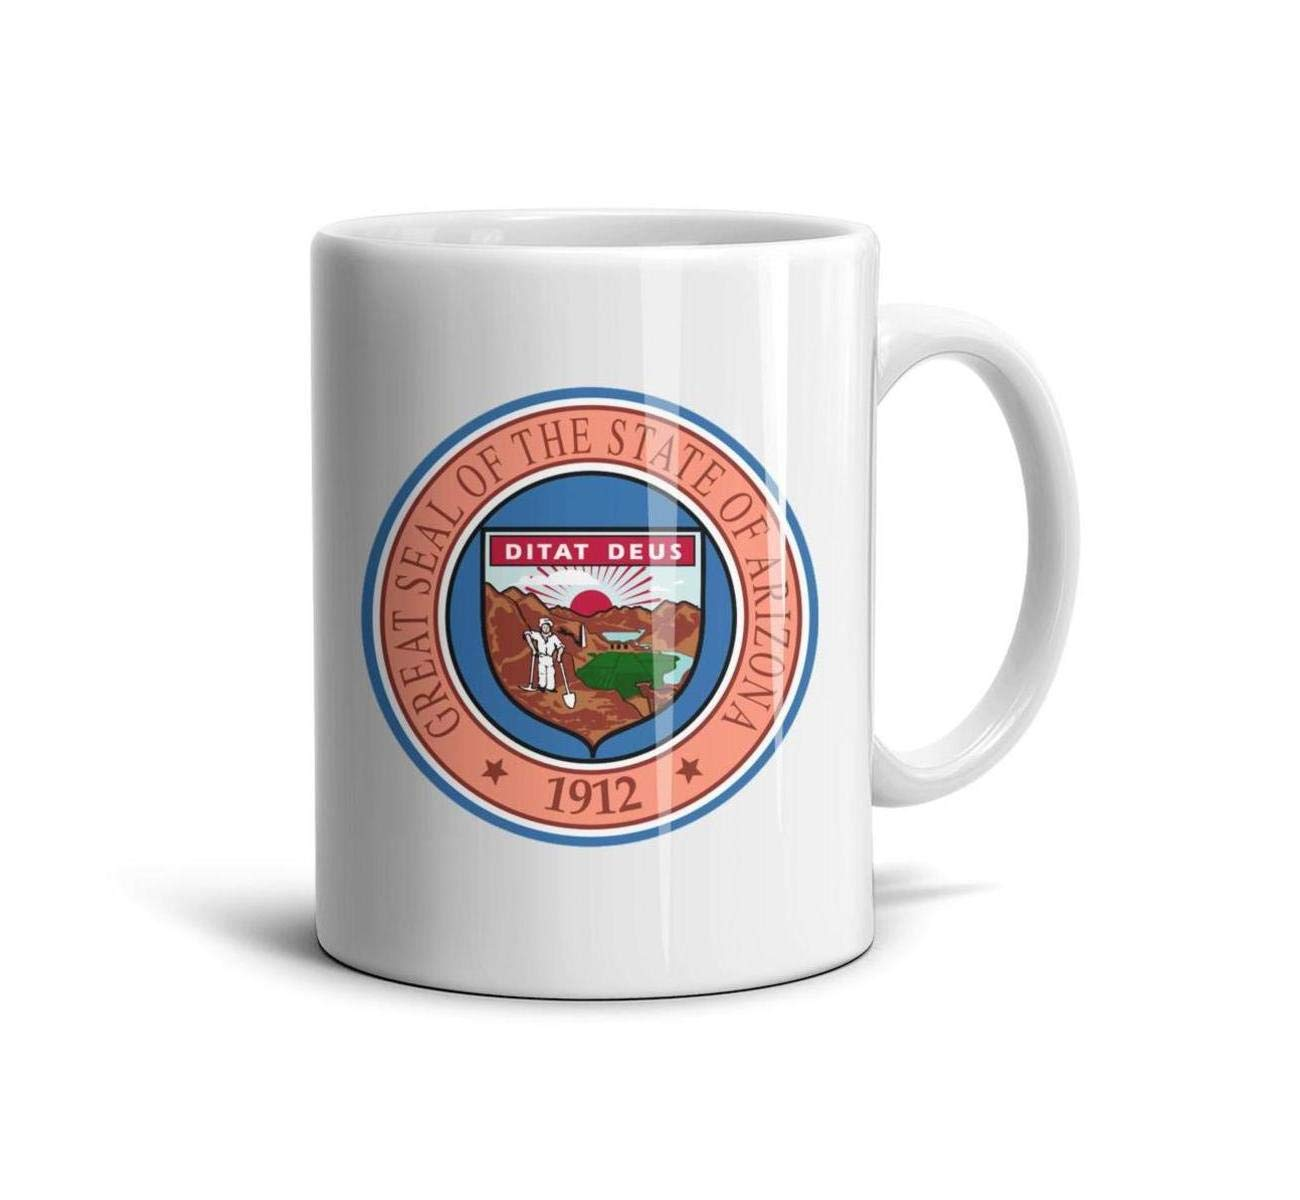 BIAOSD Best Coffee Mug Arizona Emblem Funny Mug Gifts Mug Cup 11oz for Men Women